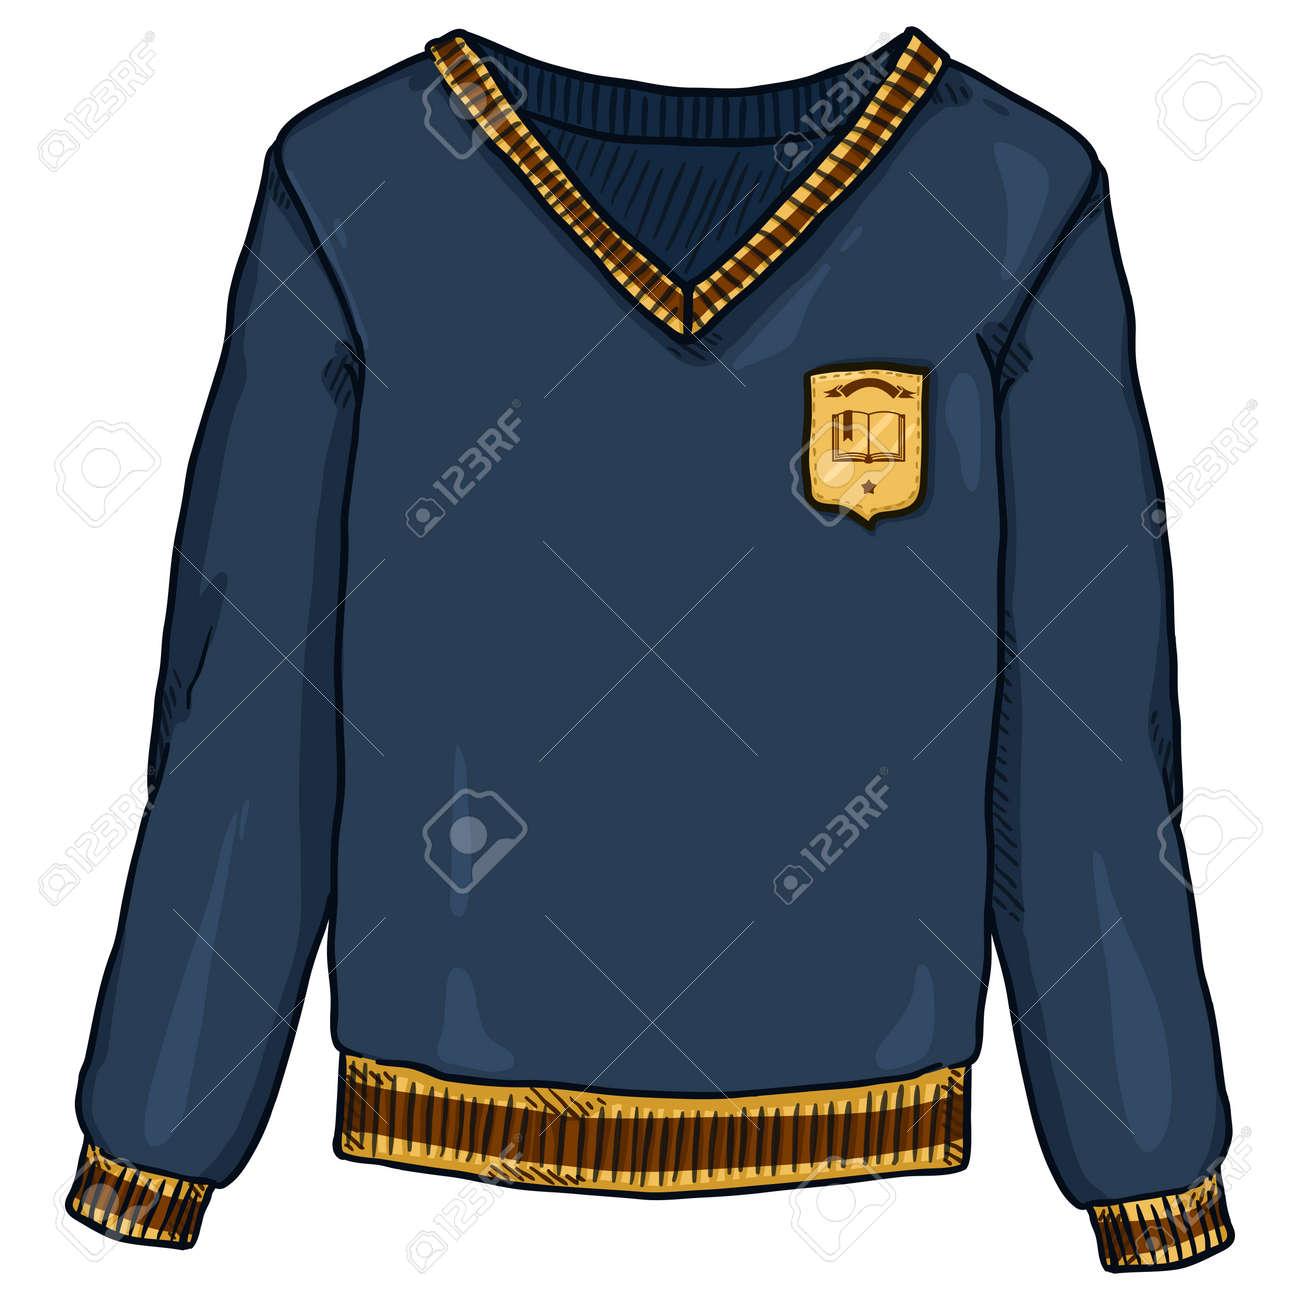 Blue Pullover with School Badge. Vector Cartoon School Uniform Illustration. - 169663684